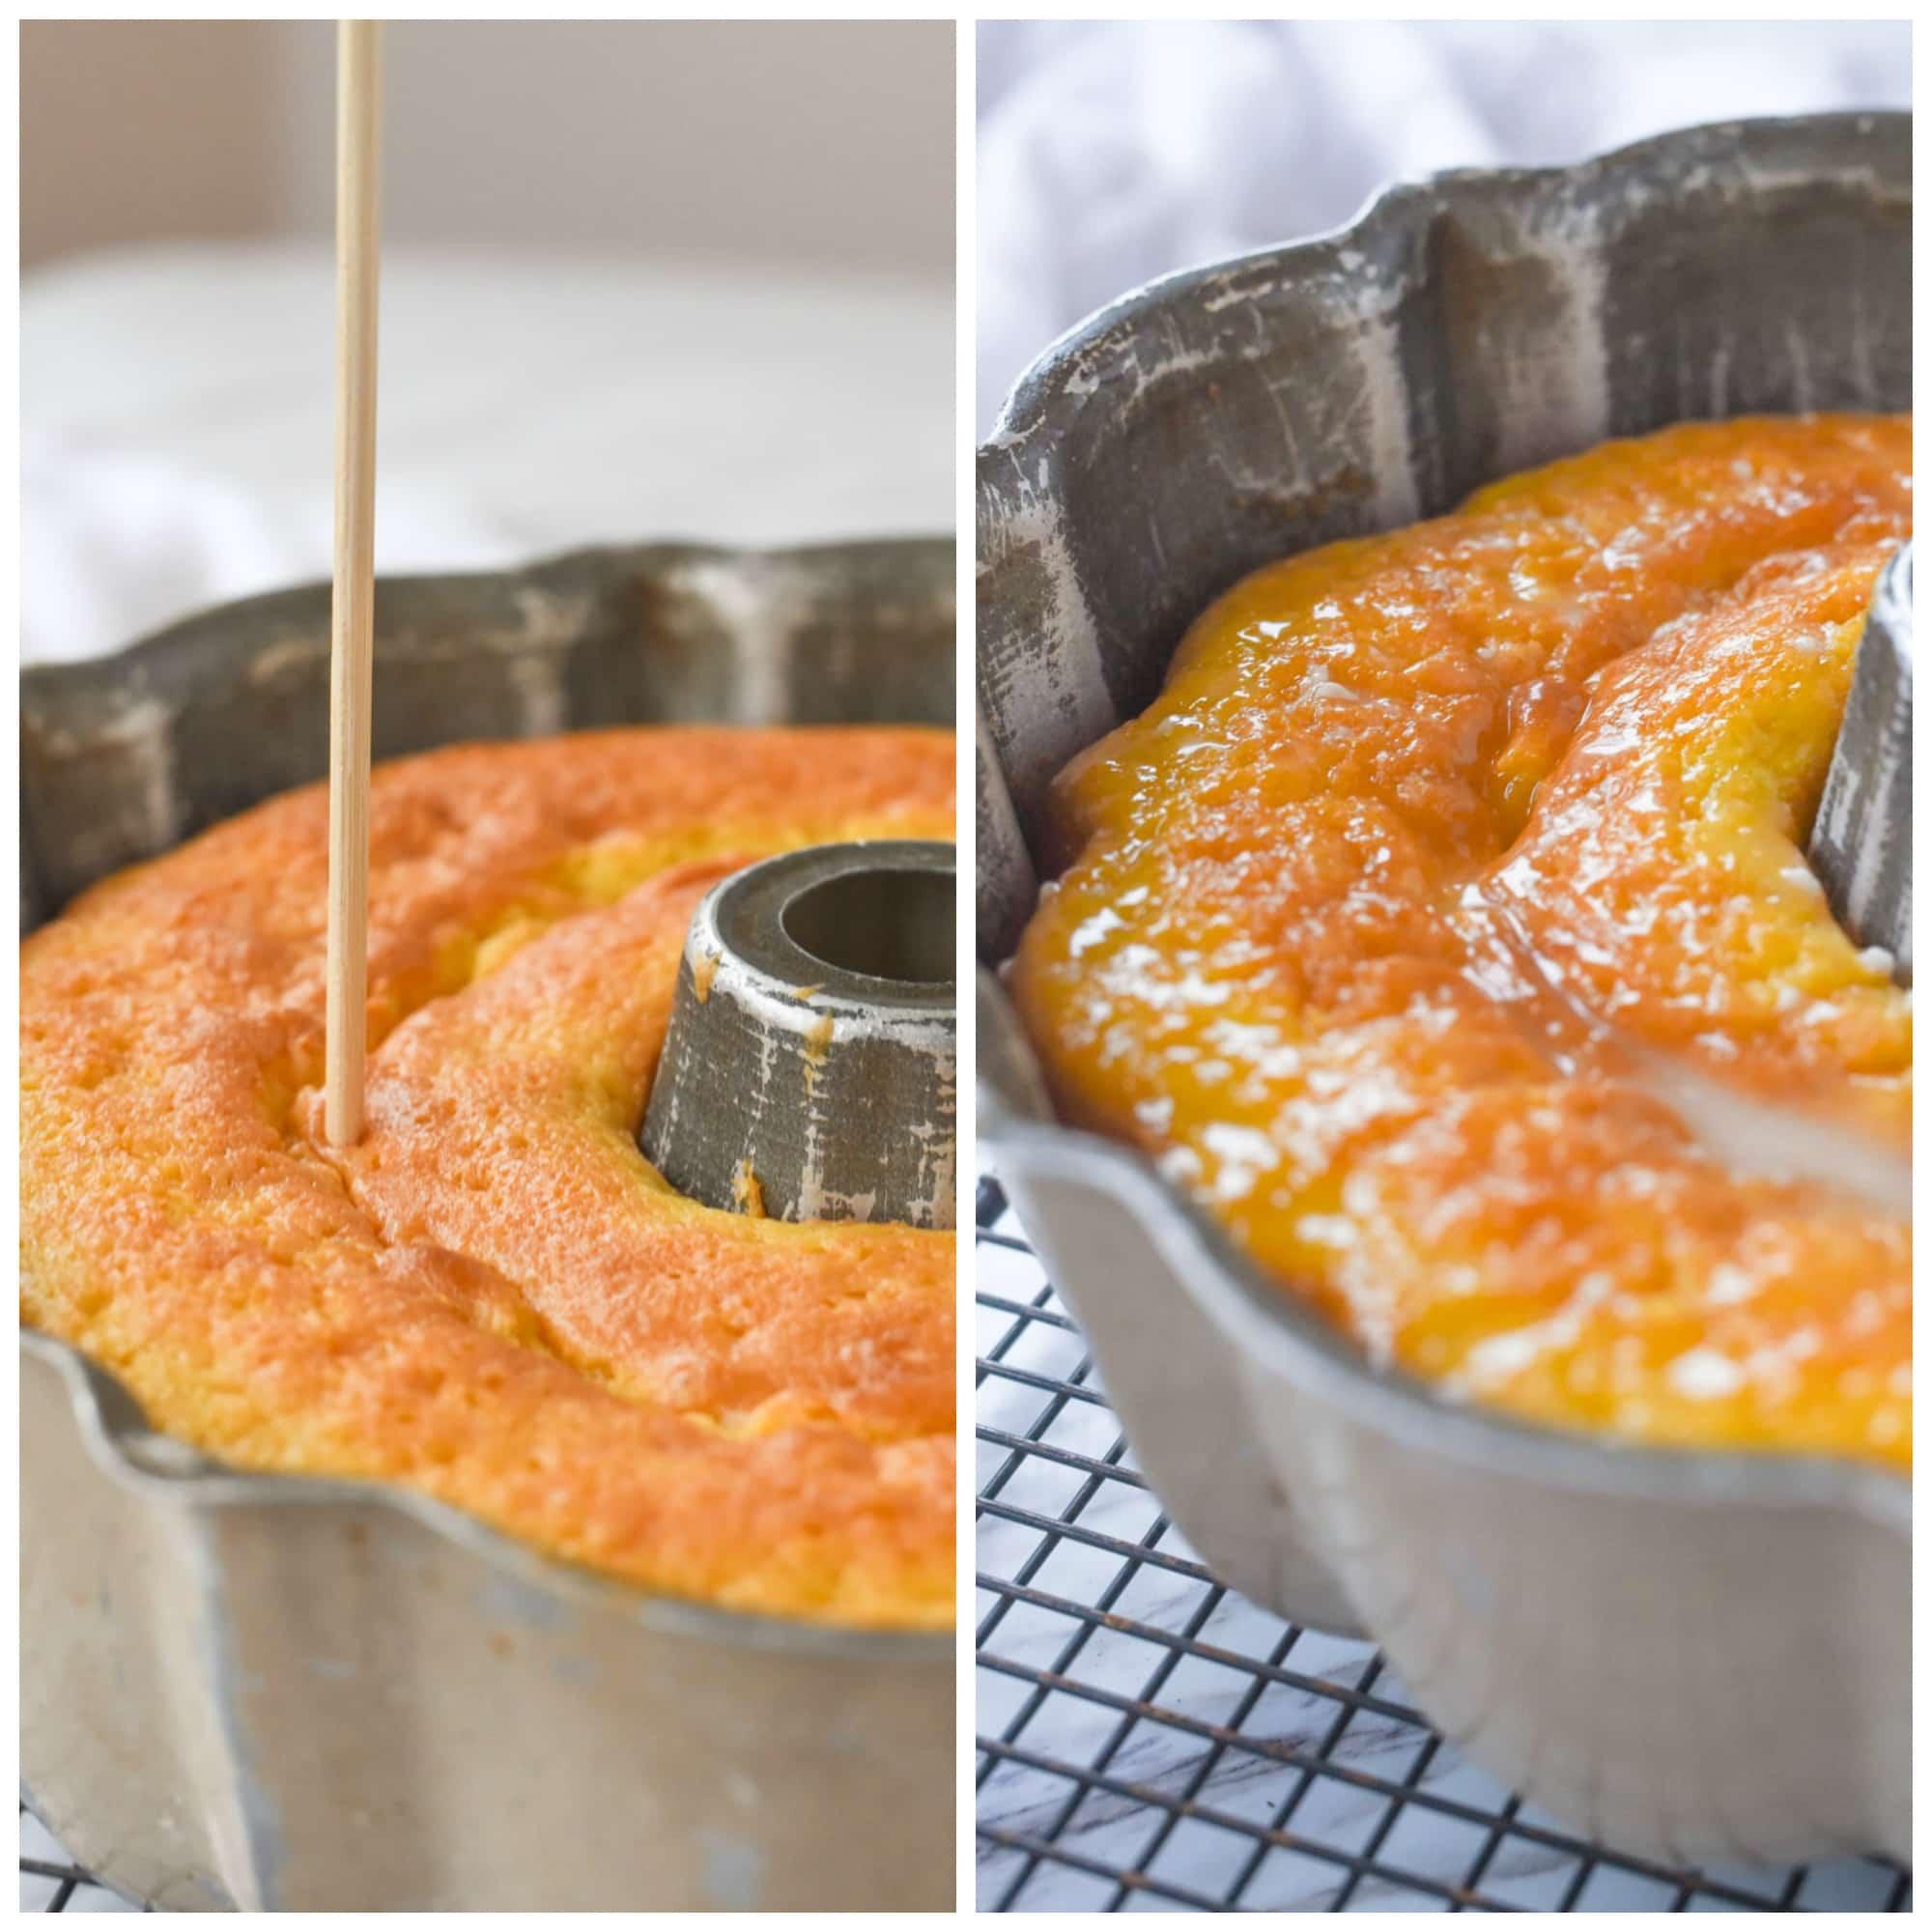 pouring glaze over key lime cake